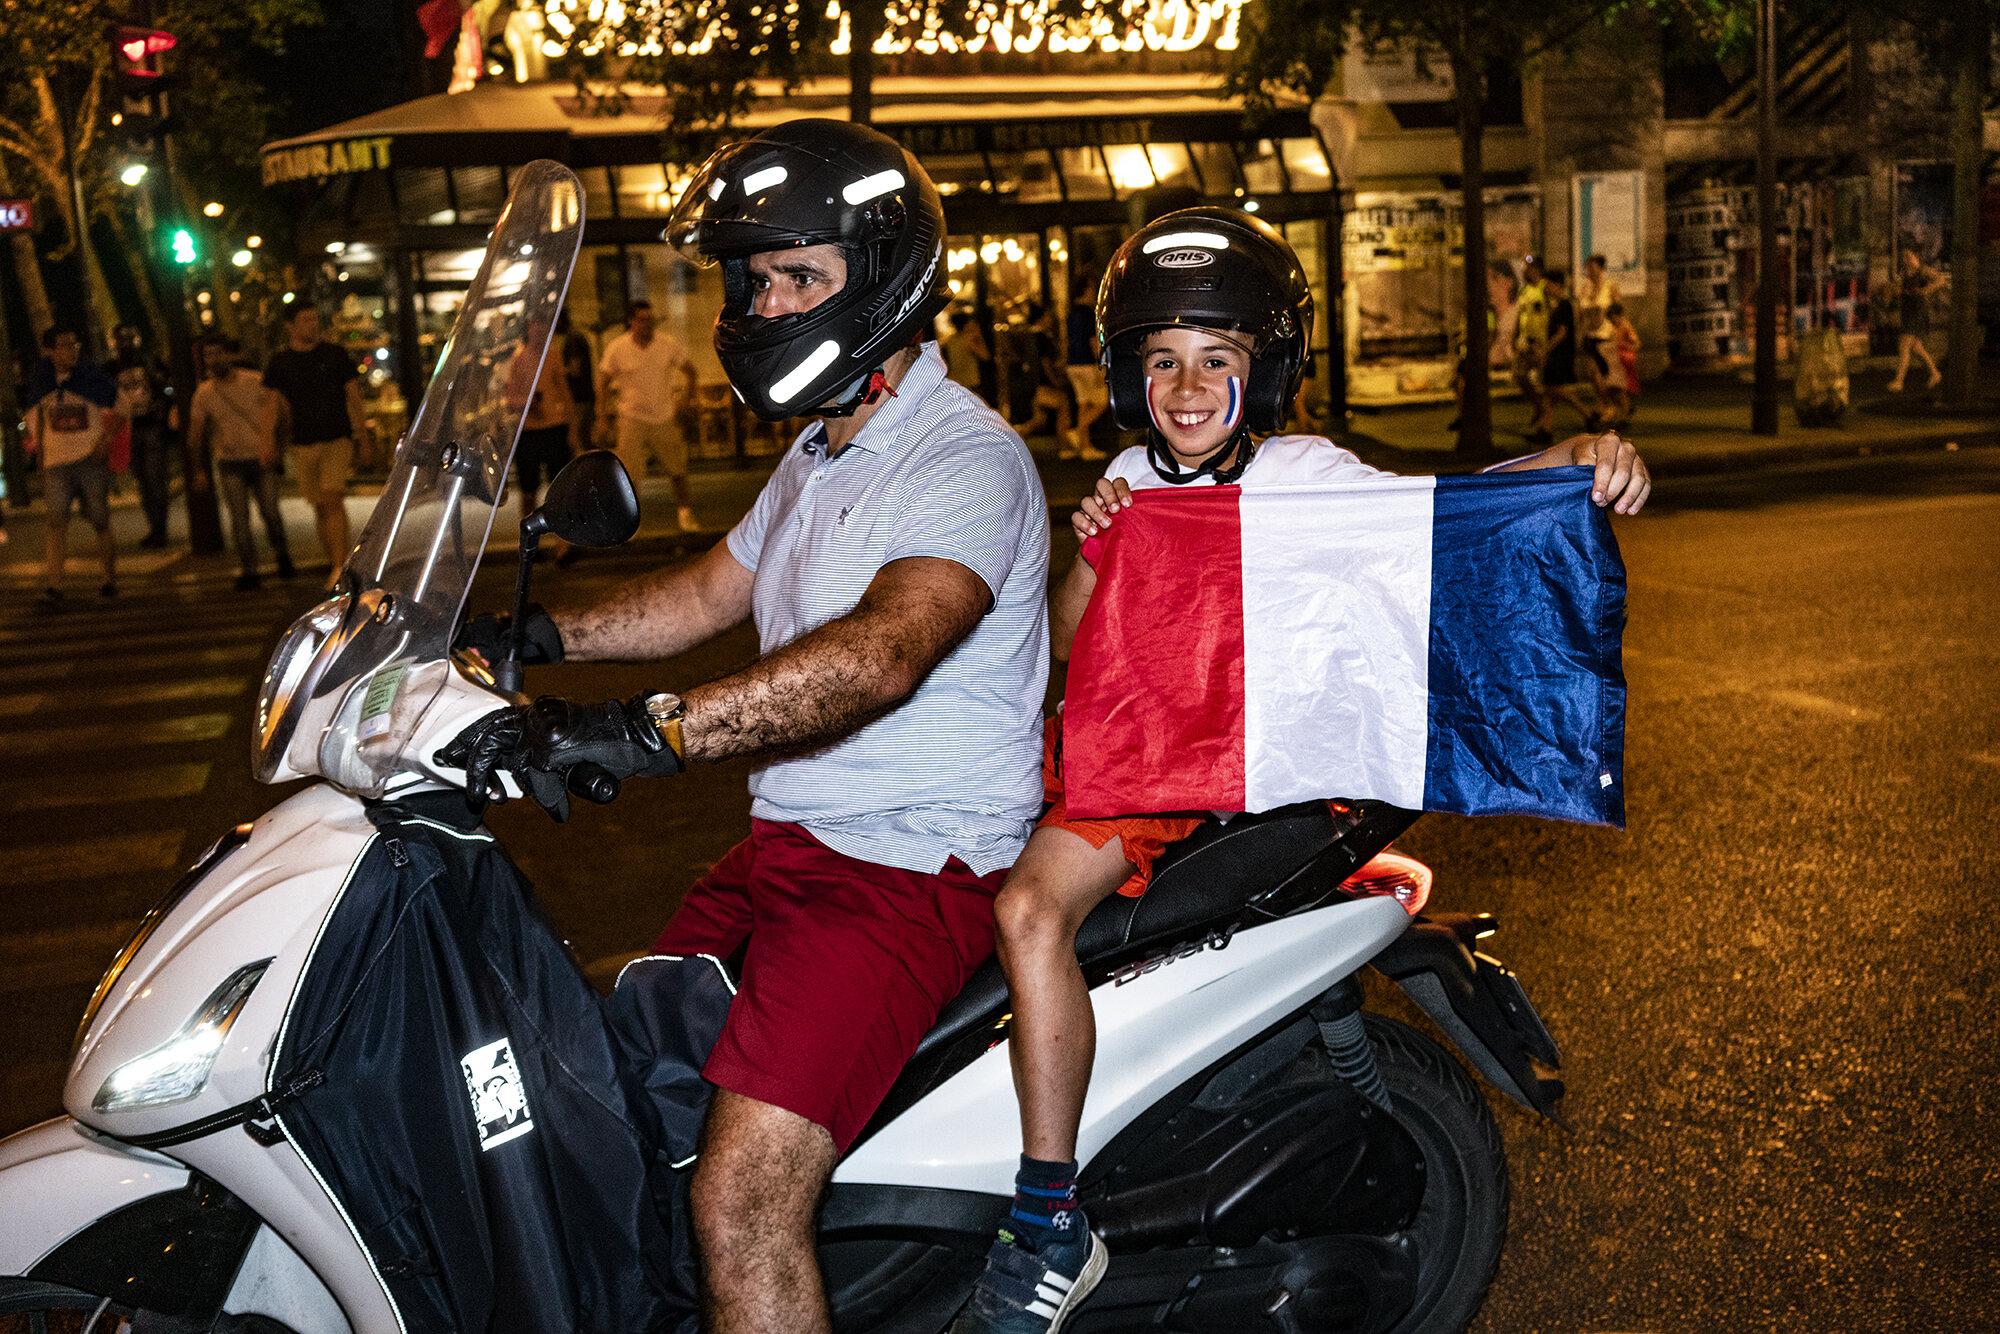 Paris_Street_2018_In_Car_Celebration-052.jpg